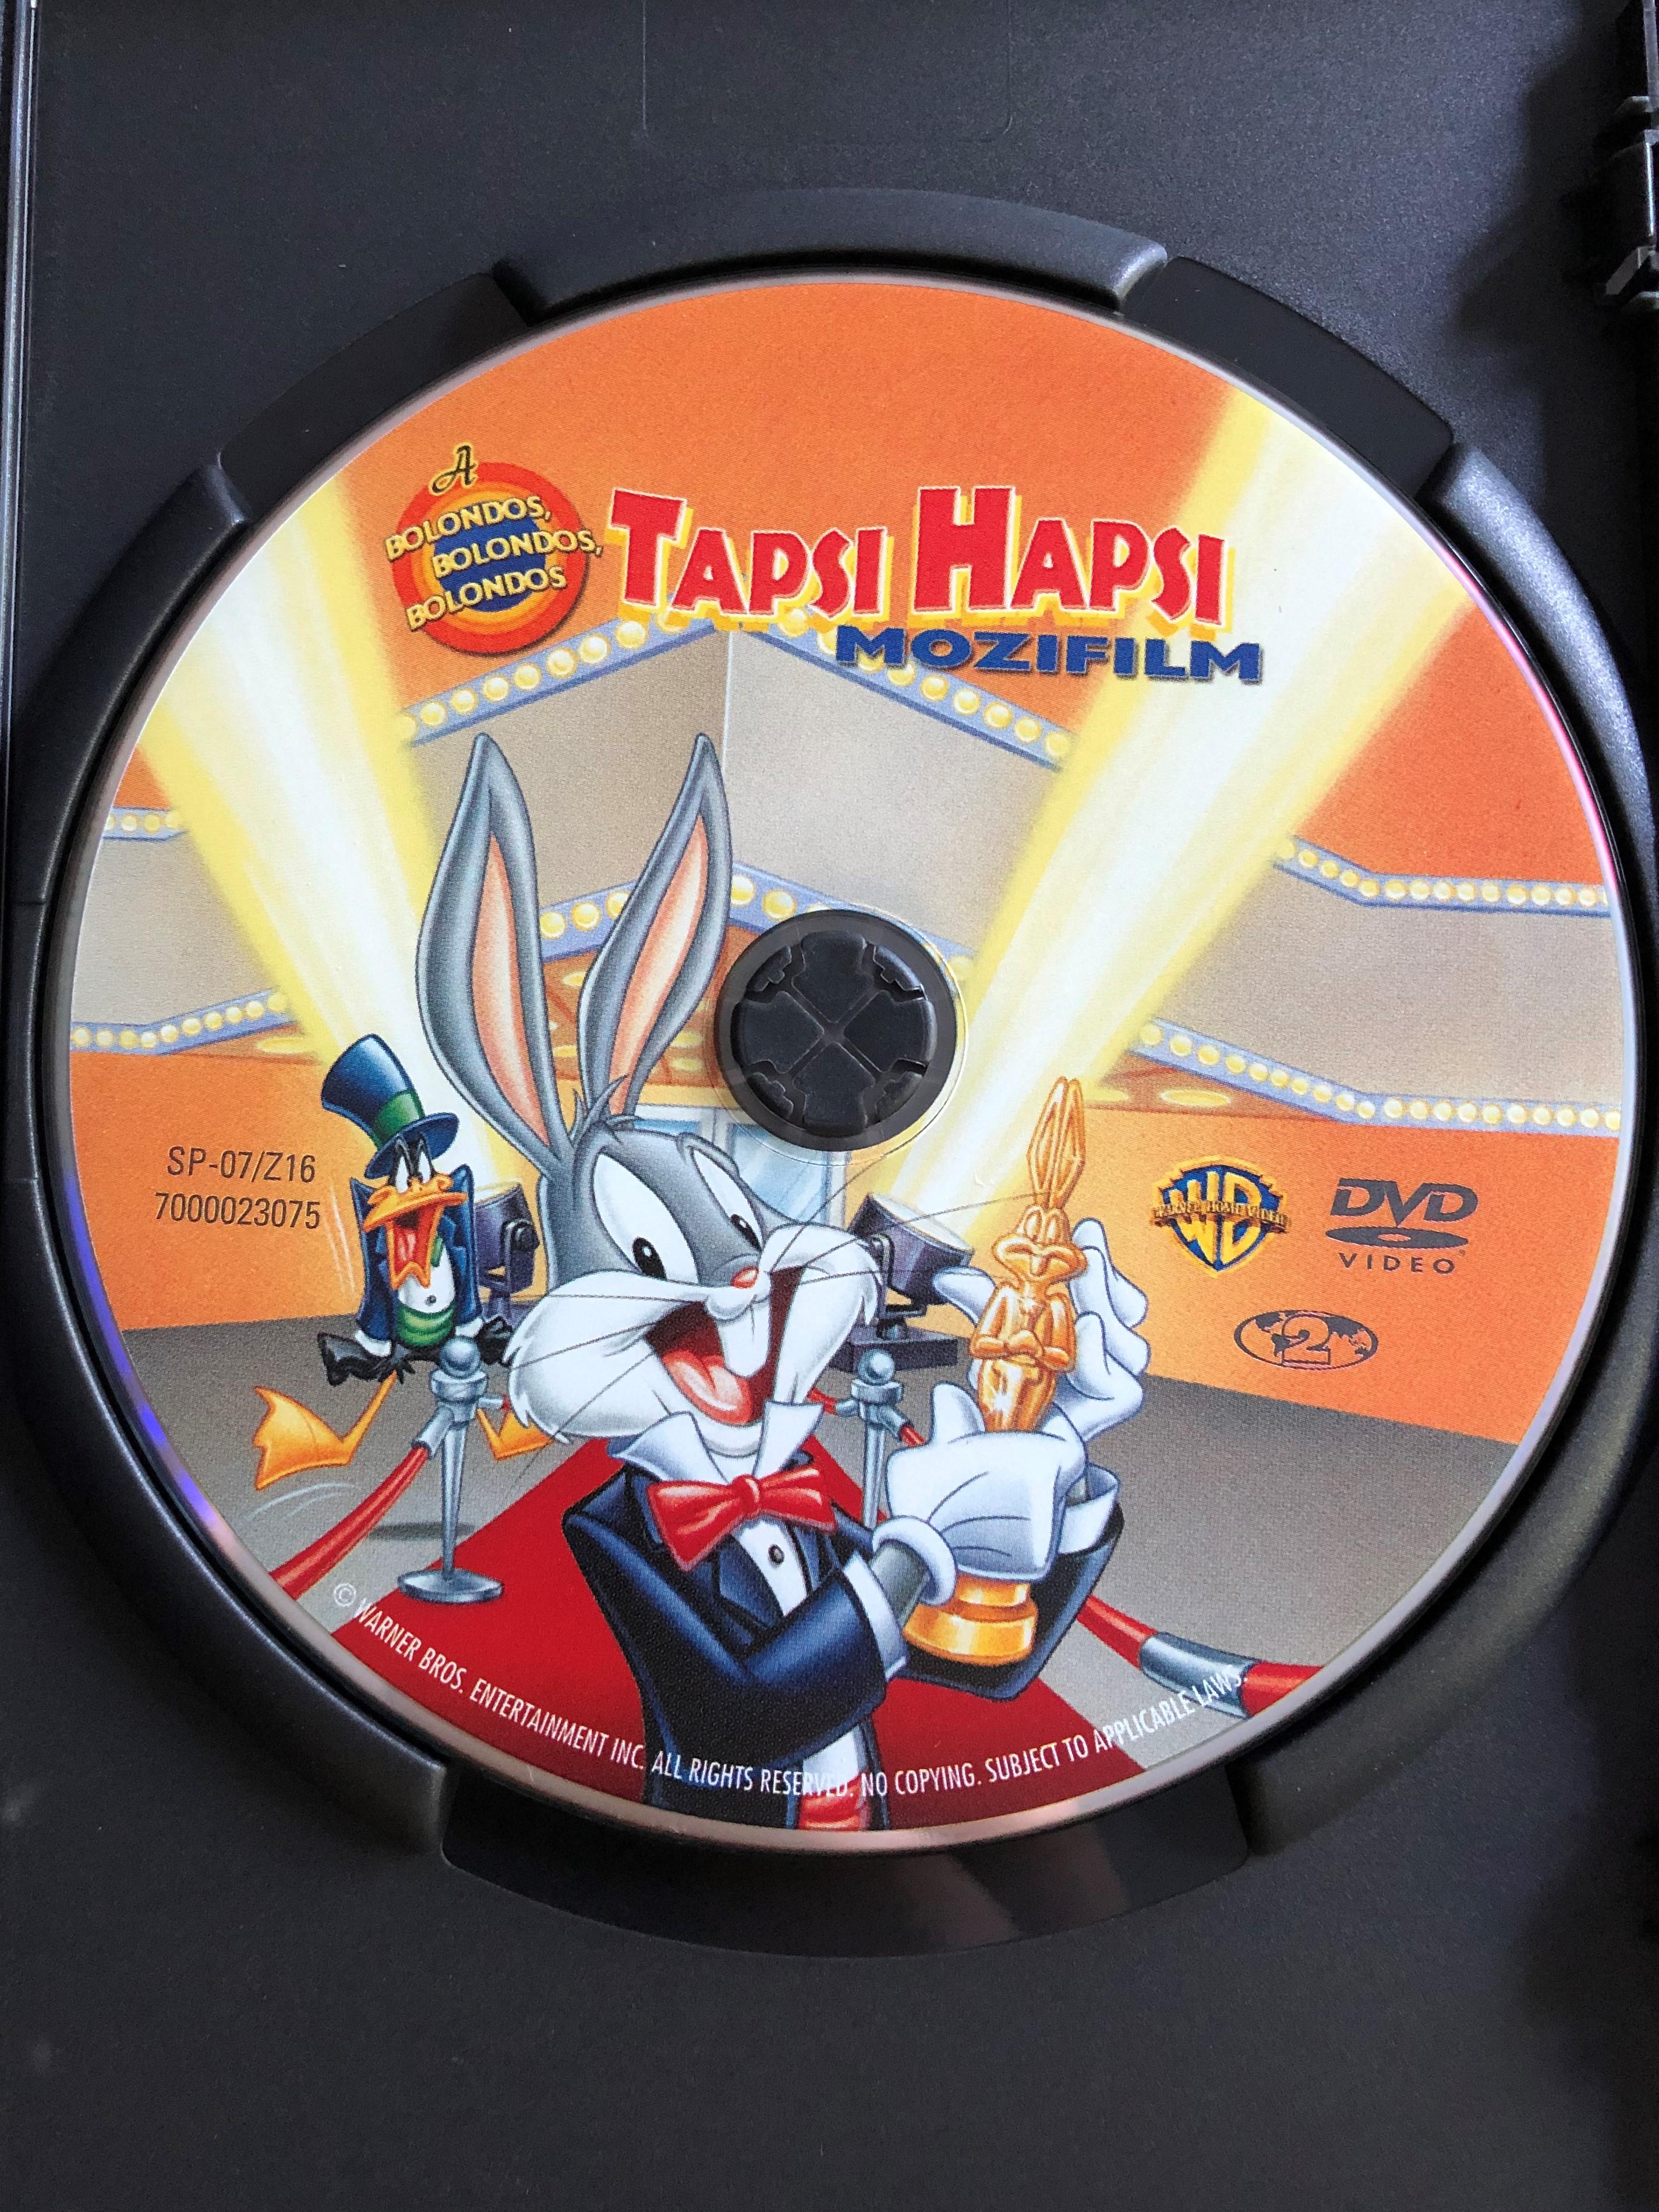 the-looney-looney-looney-bugs-bunny-movie-dvd-1981-a-bolondos-bolondos-bolondos-tapsi-hapsi-mozifilm-directed-by-friz-freleng-starring-mel-blanc-june-foray-2-.jpg